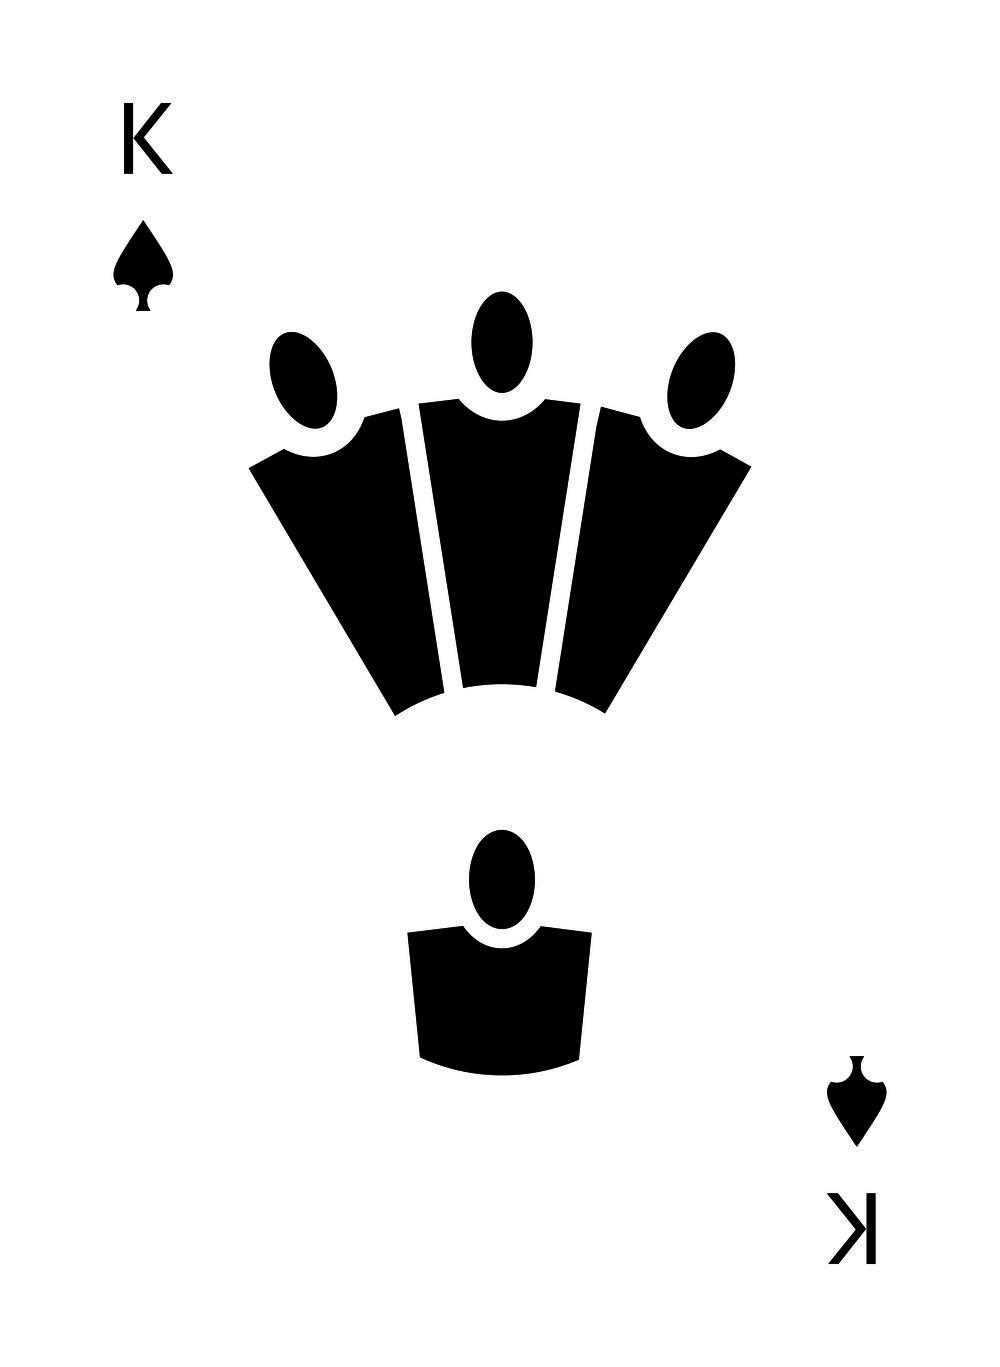 52_2__0000_Spades_King.jpg